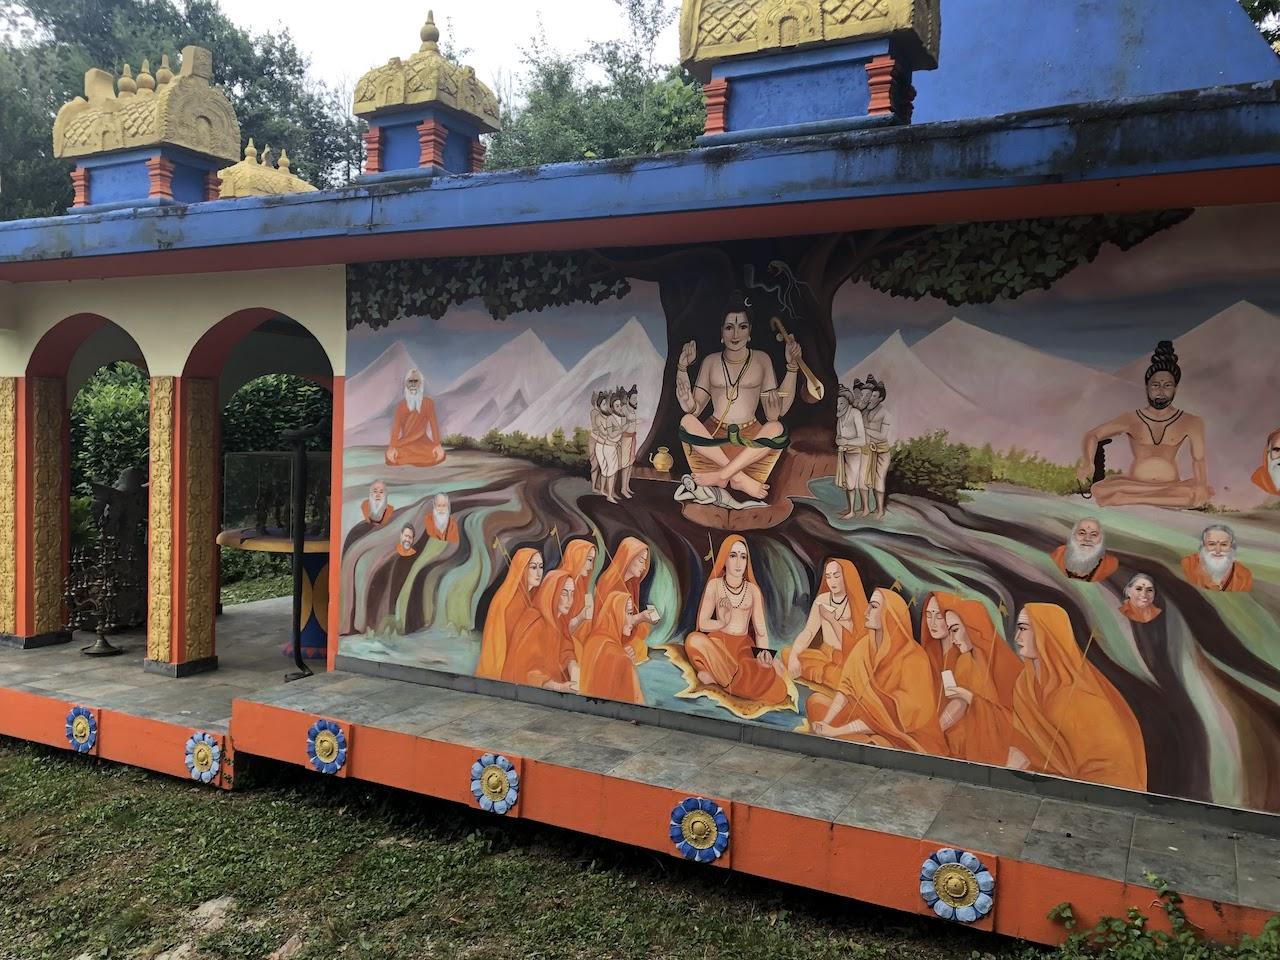 Lalitha Tiripurasundari Hindu Temple in Italy